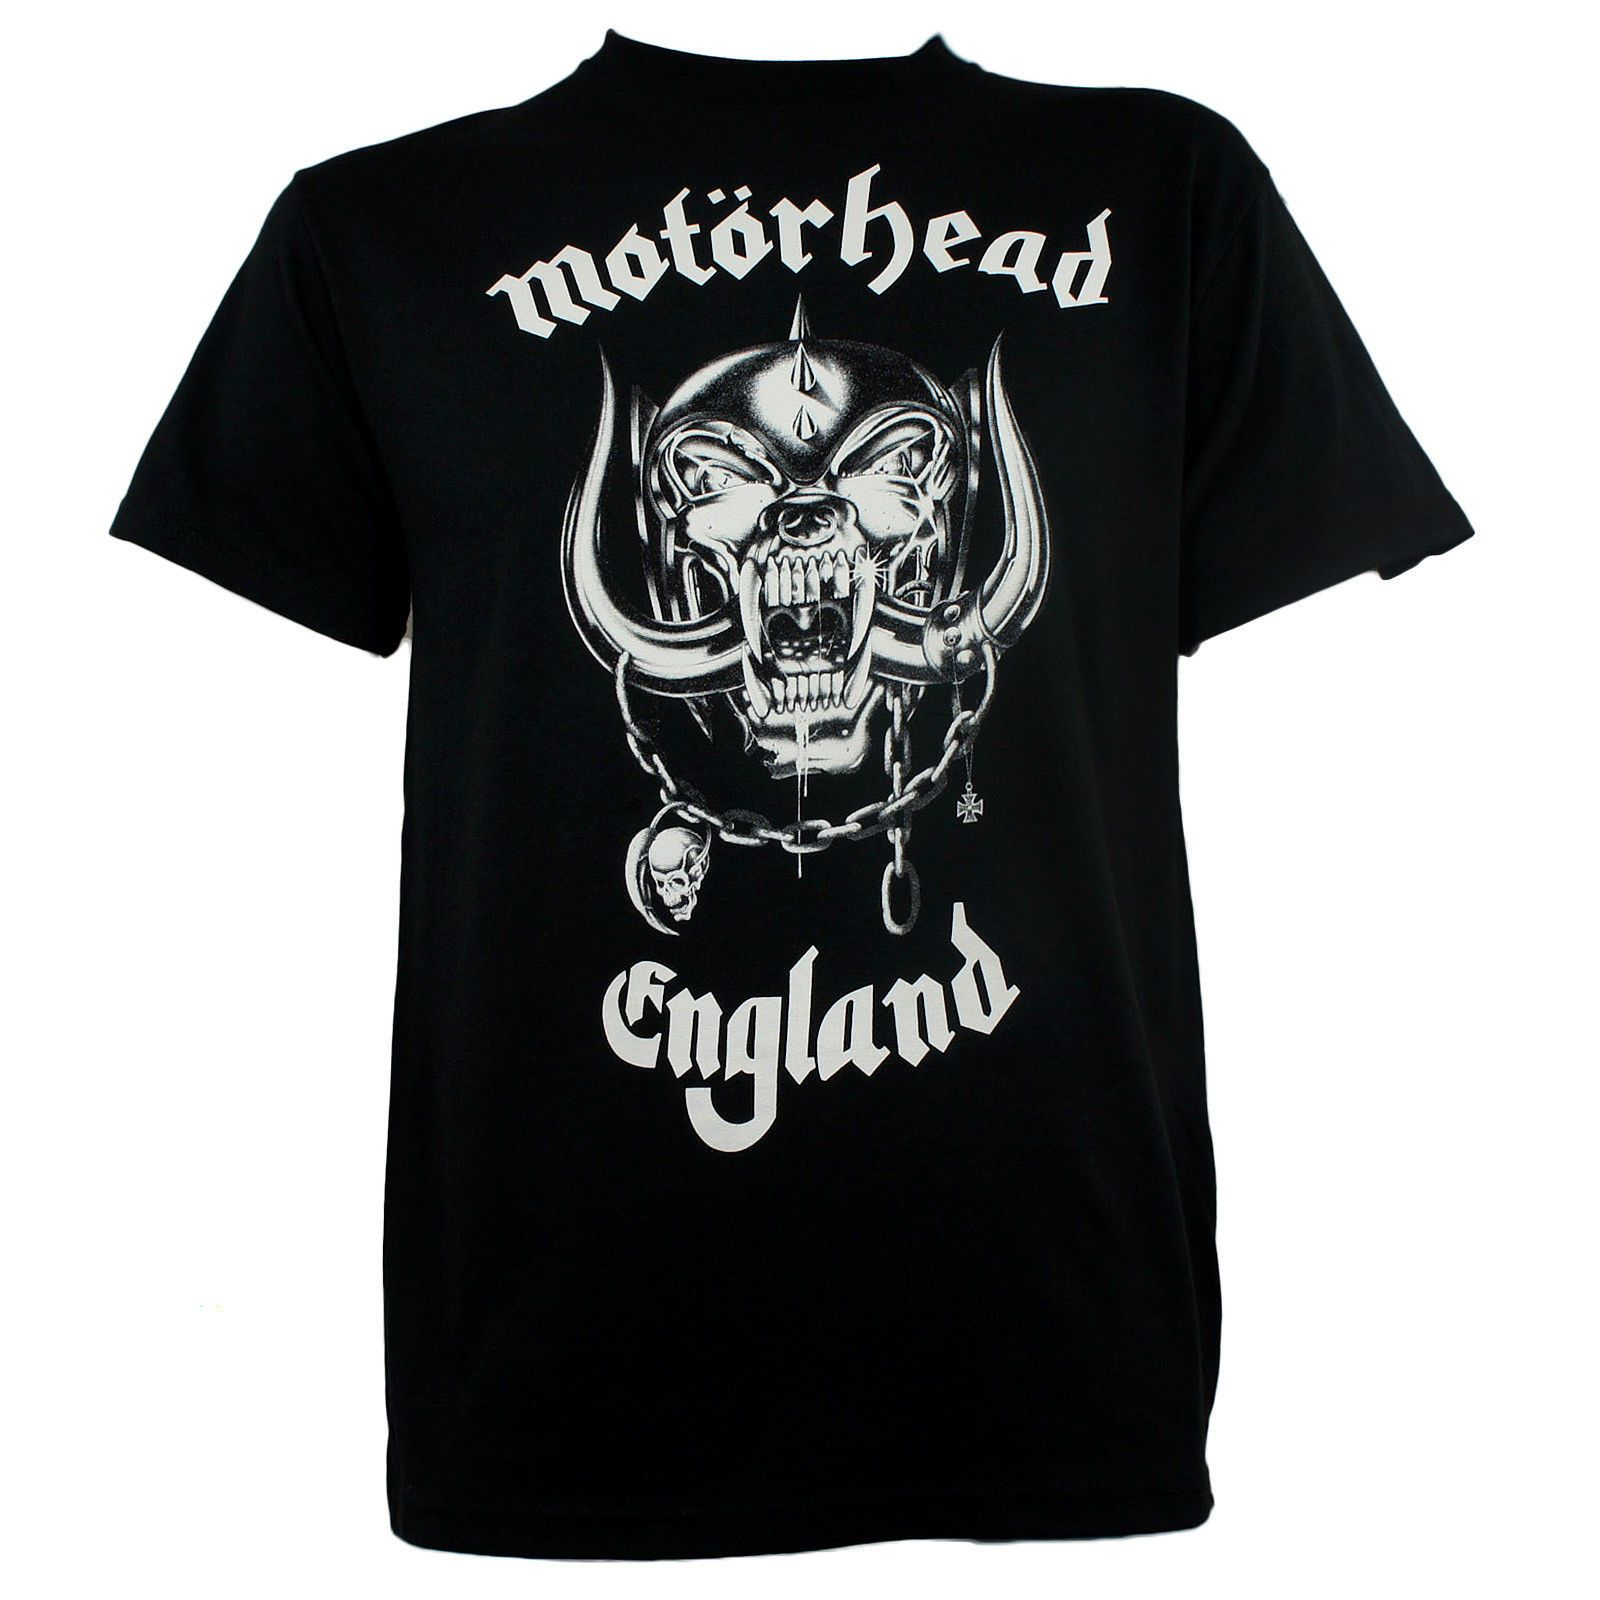 Authentic MOTORHEAD War Pig England Front Print T-SHIRT S M L XL 2XL Lemmy NEW